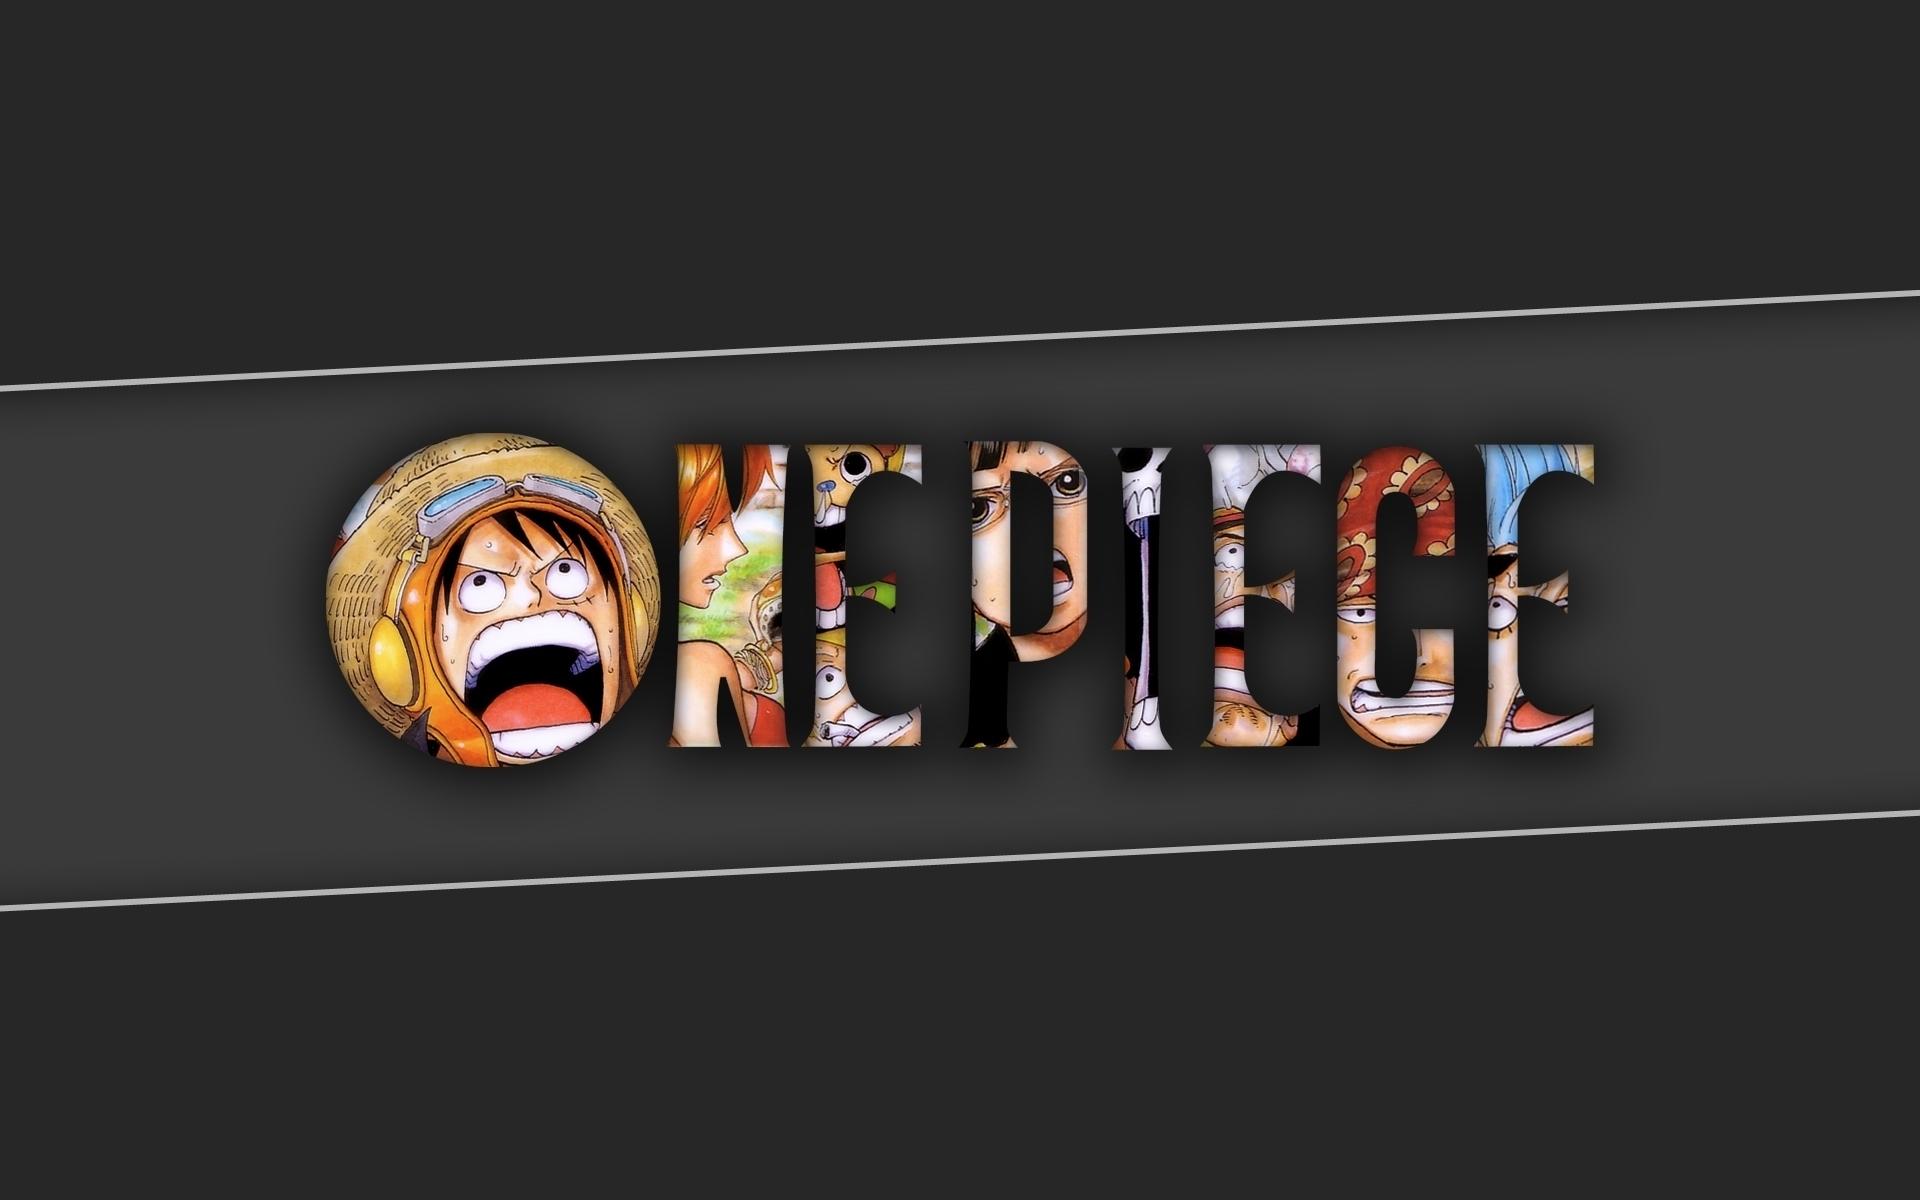 One Piece New World Hd Wallpaper